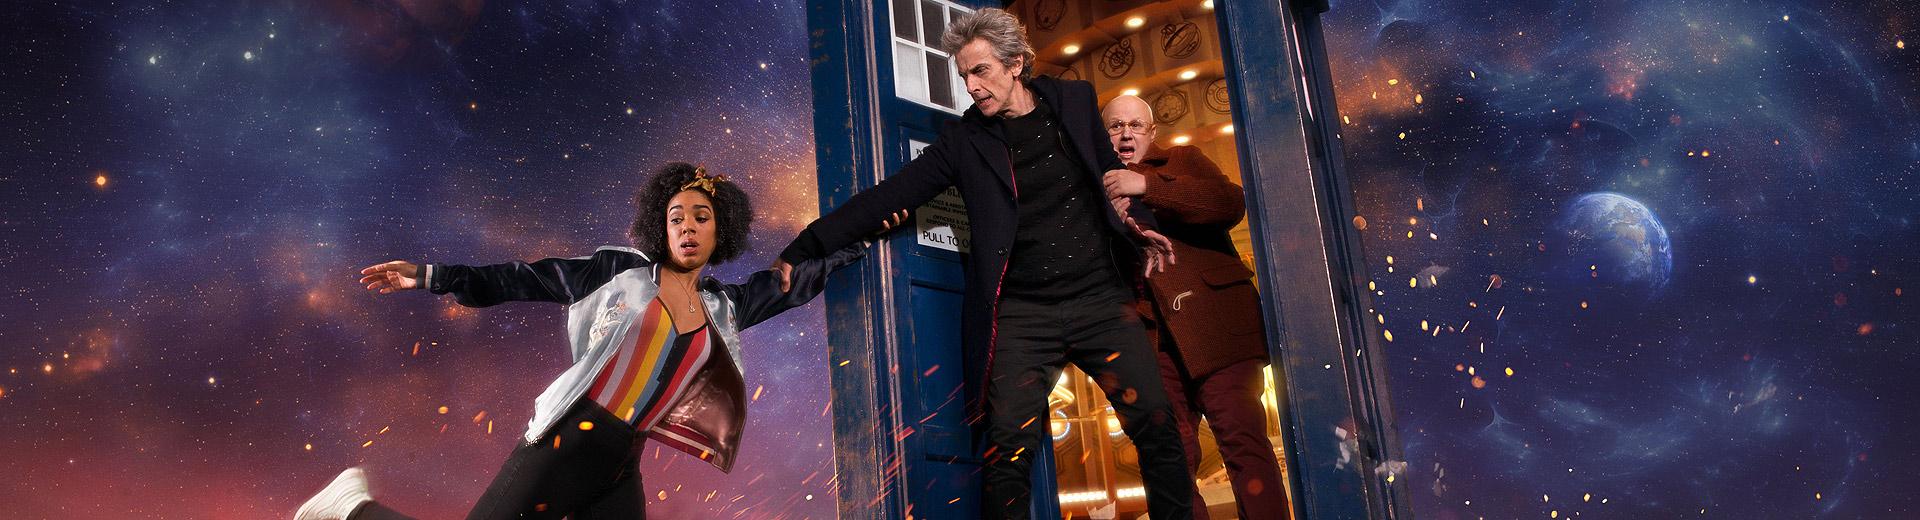 DoctorWho-Capaldi-Trailer-banner-1920x520.jpg